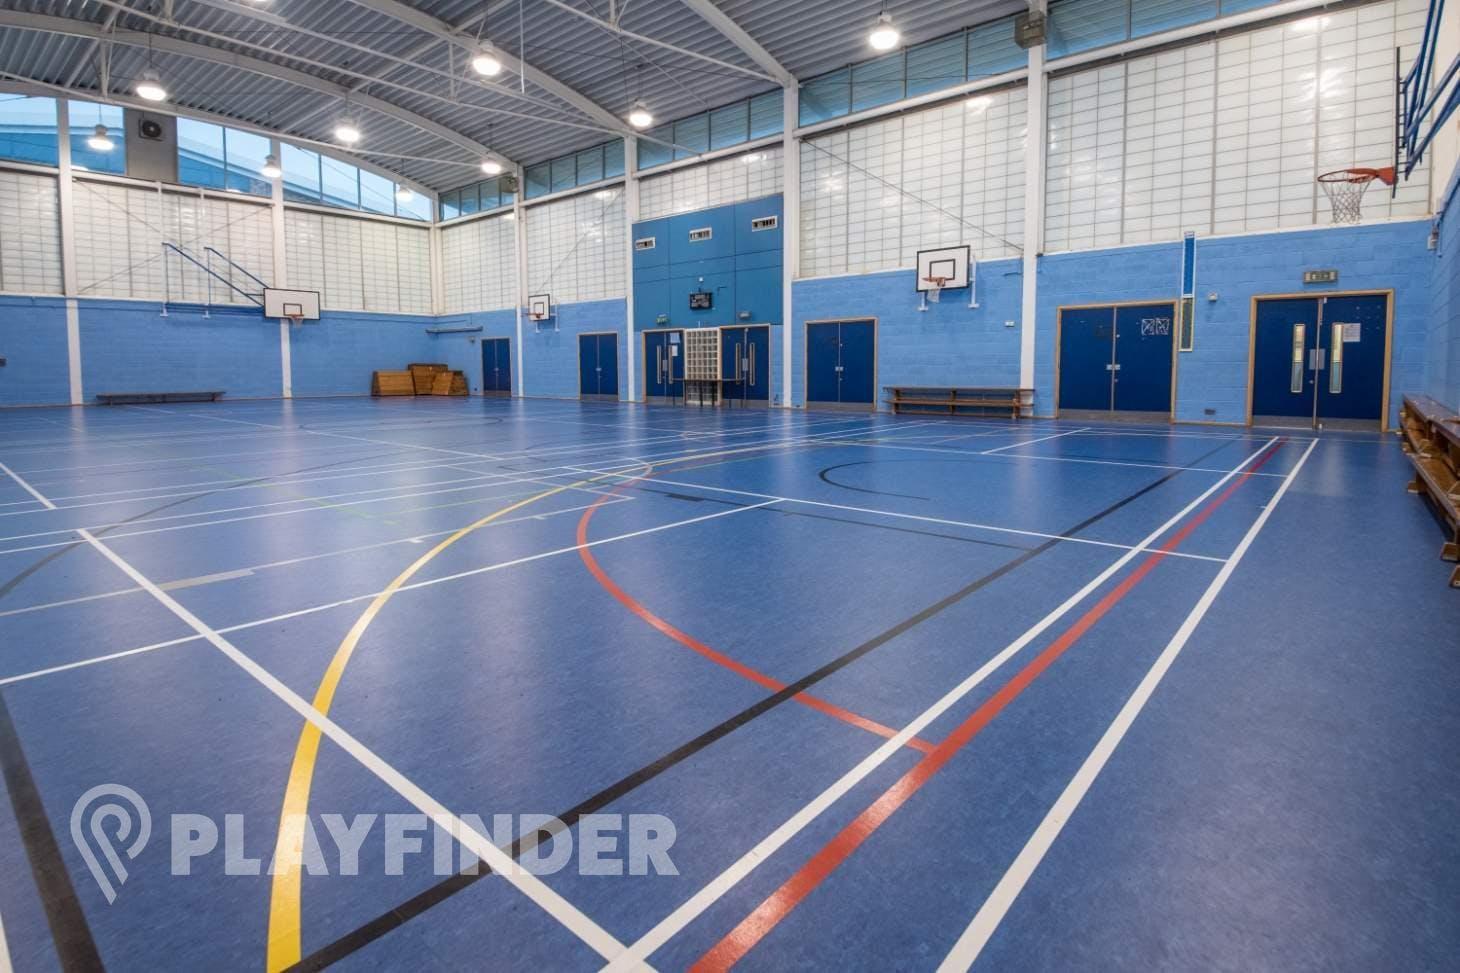 Ark Burlington Danes Academy Court | Sports hall volleyball court